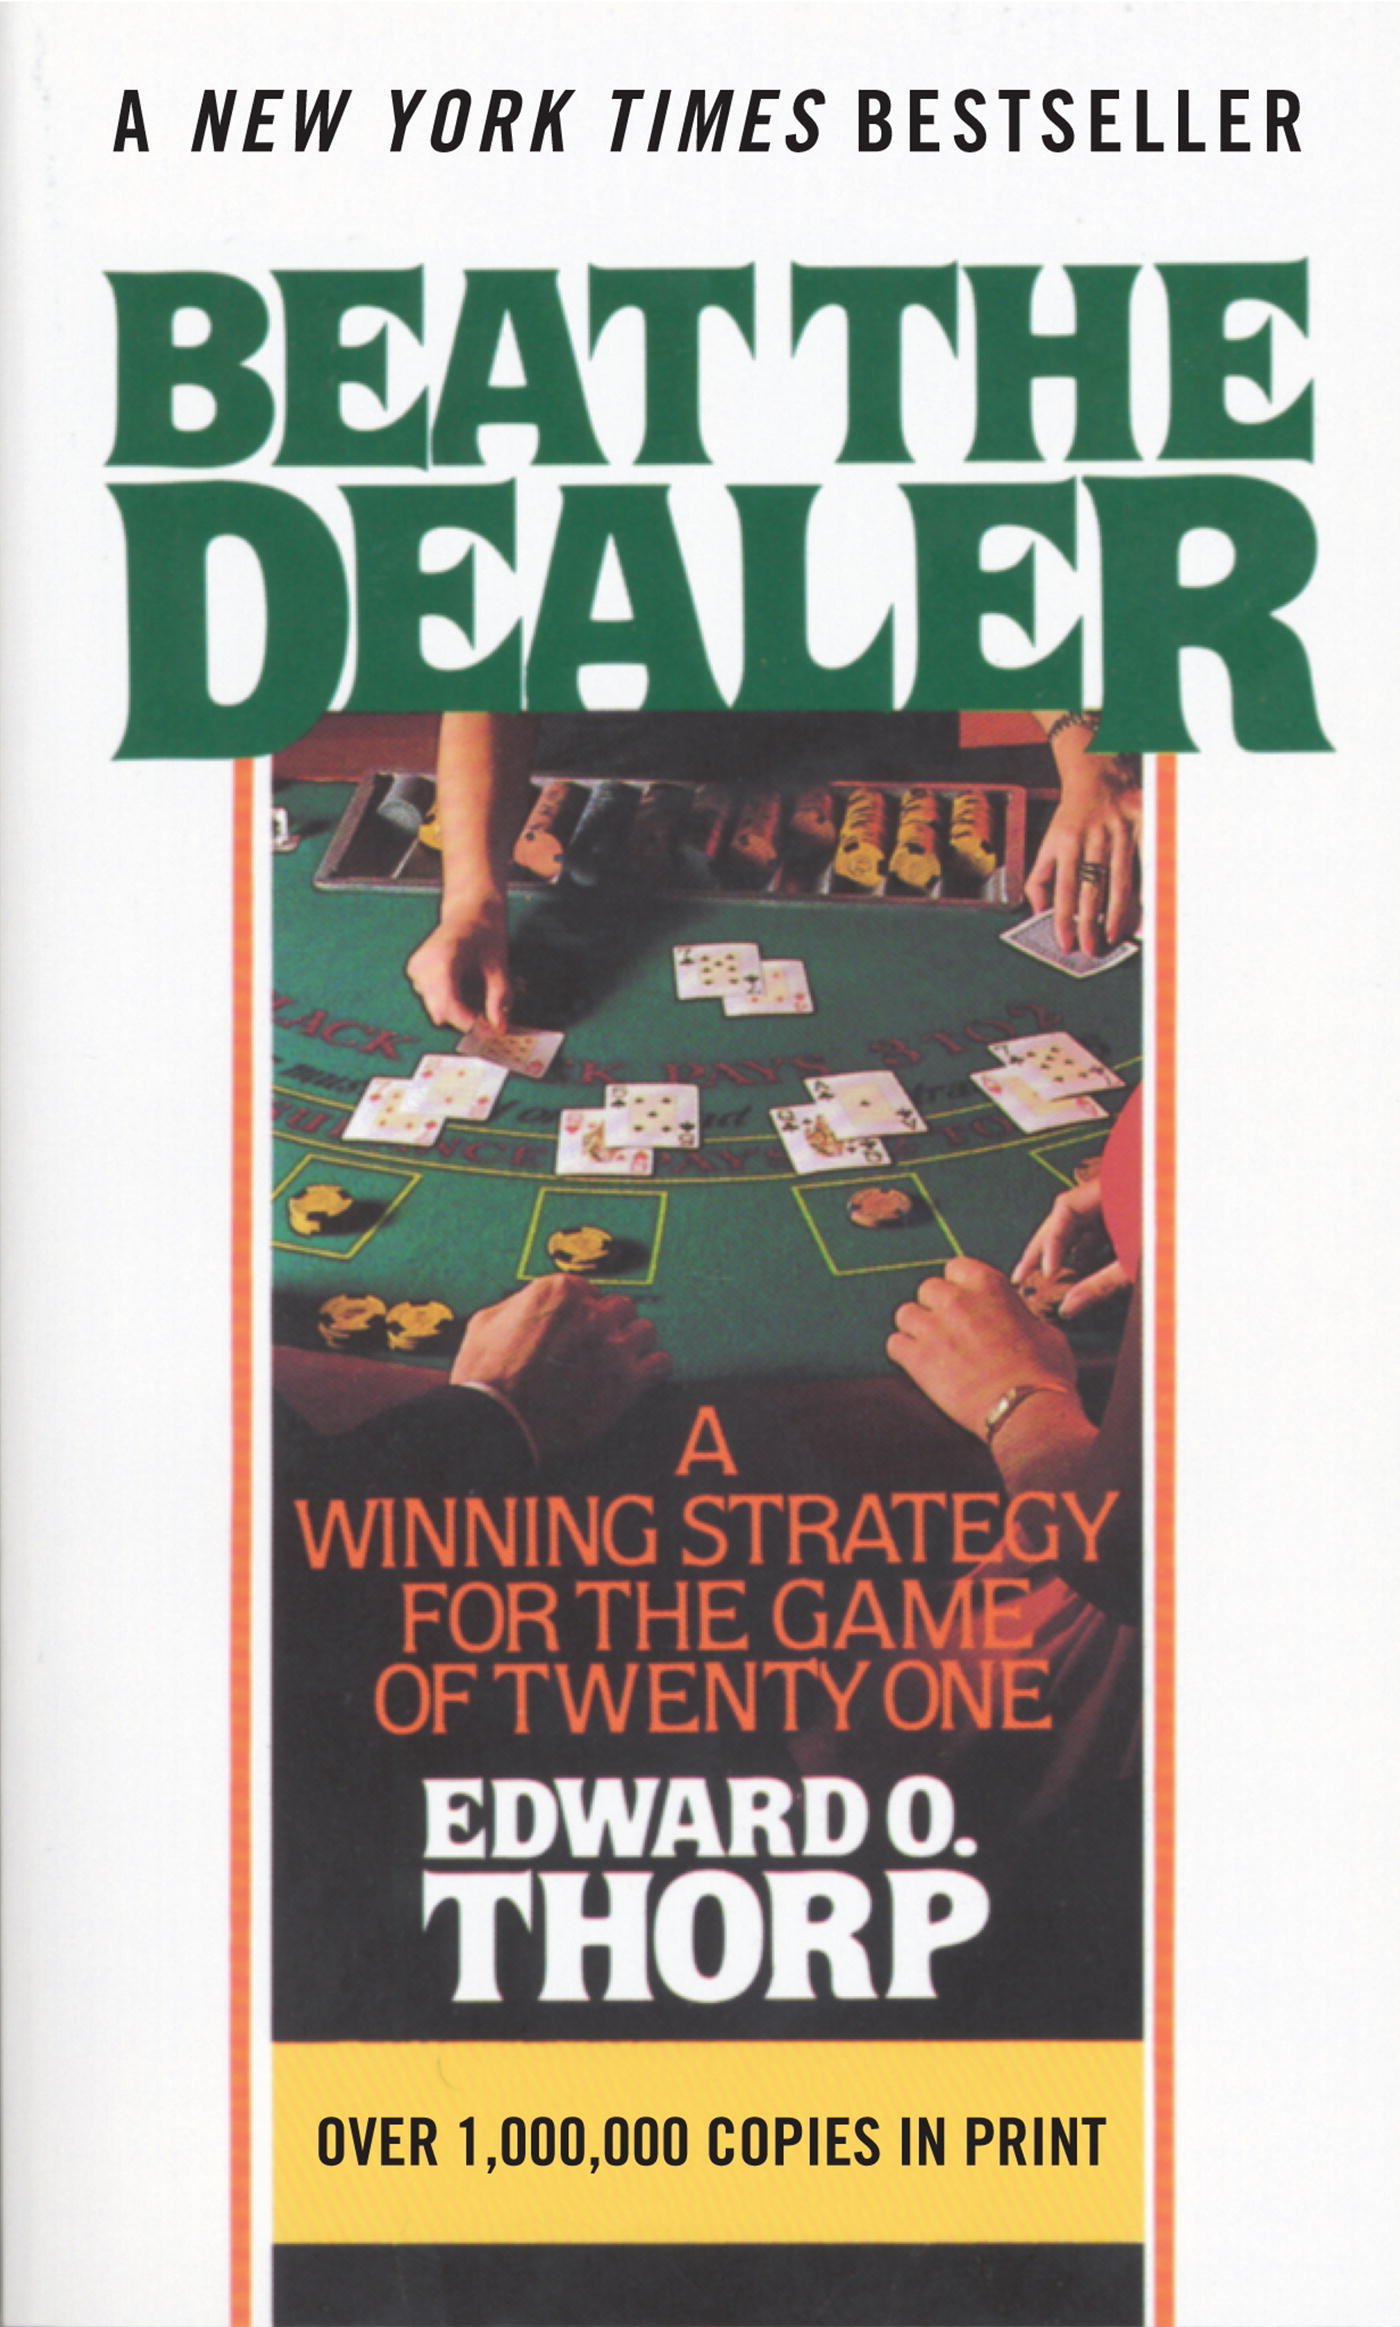 Beat the dealer casino game casino cruise from new york